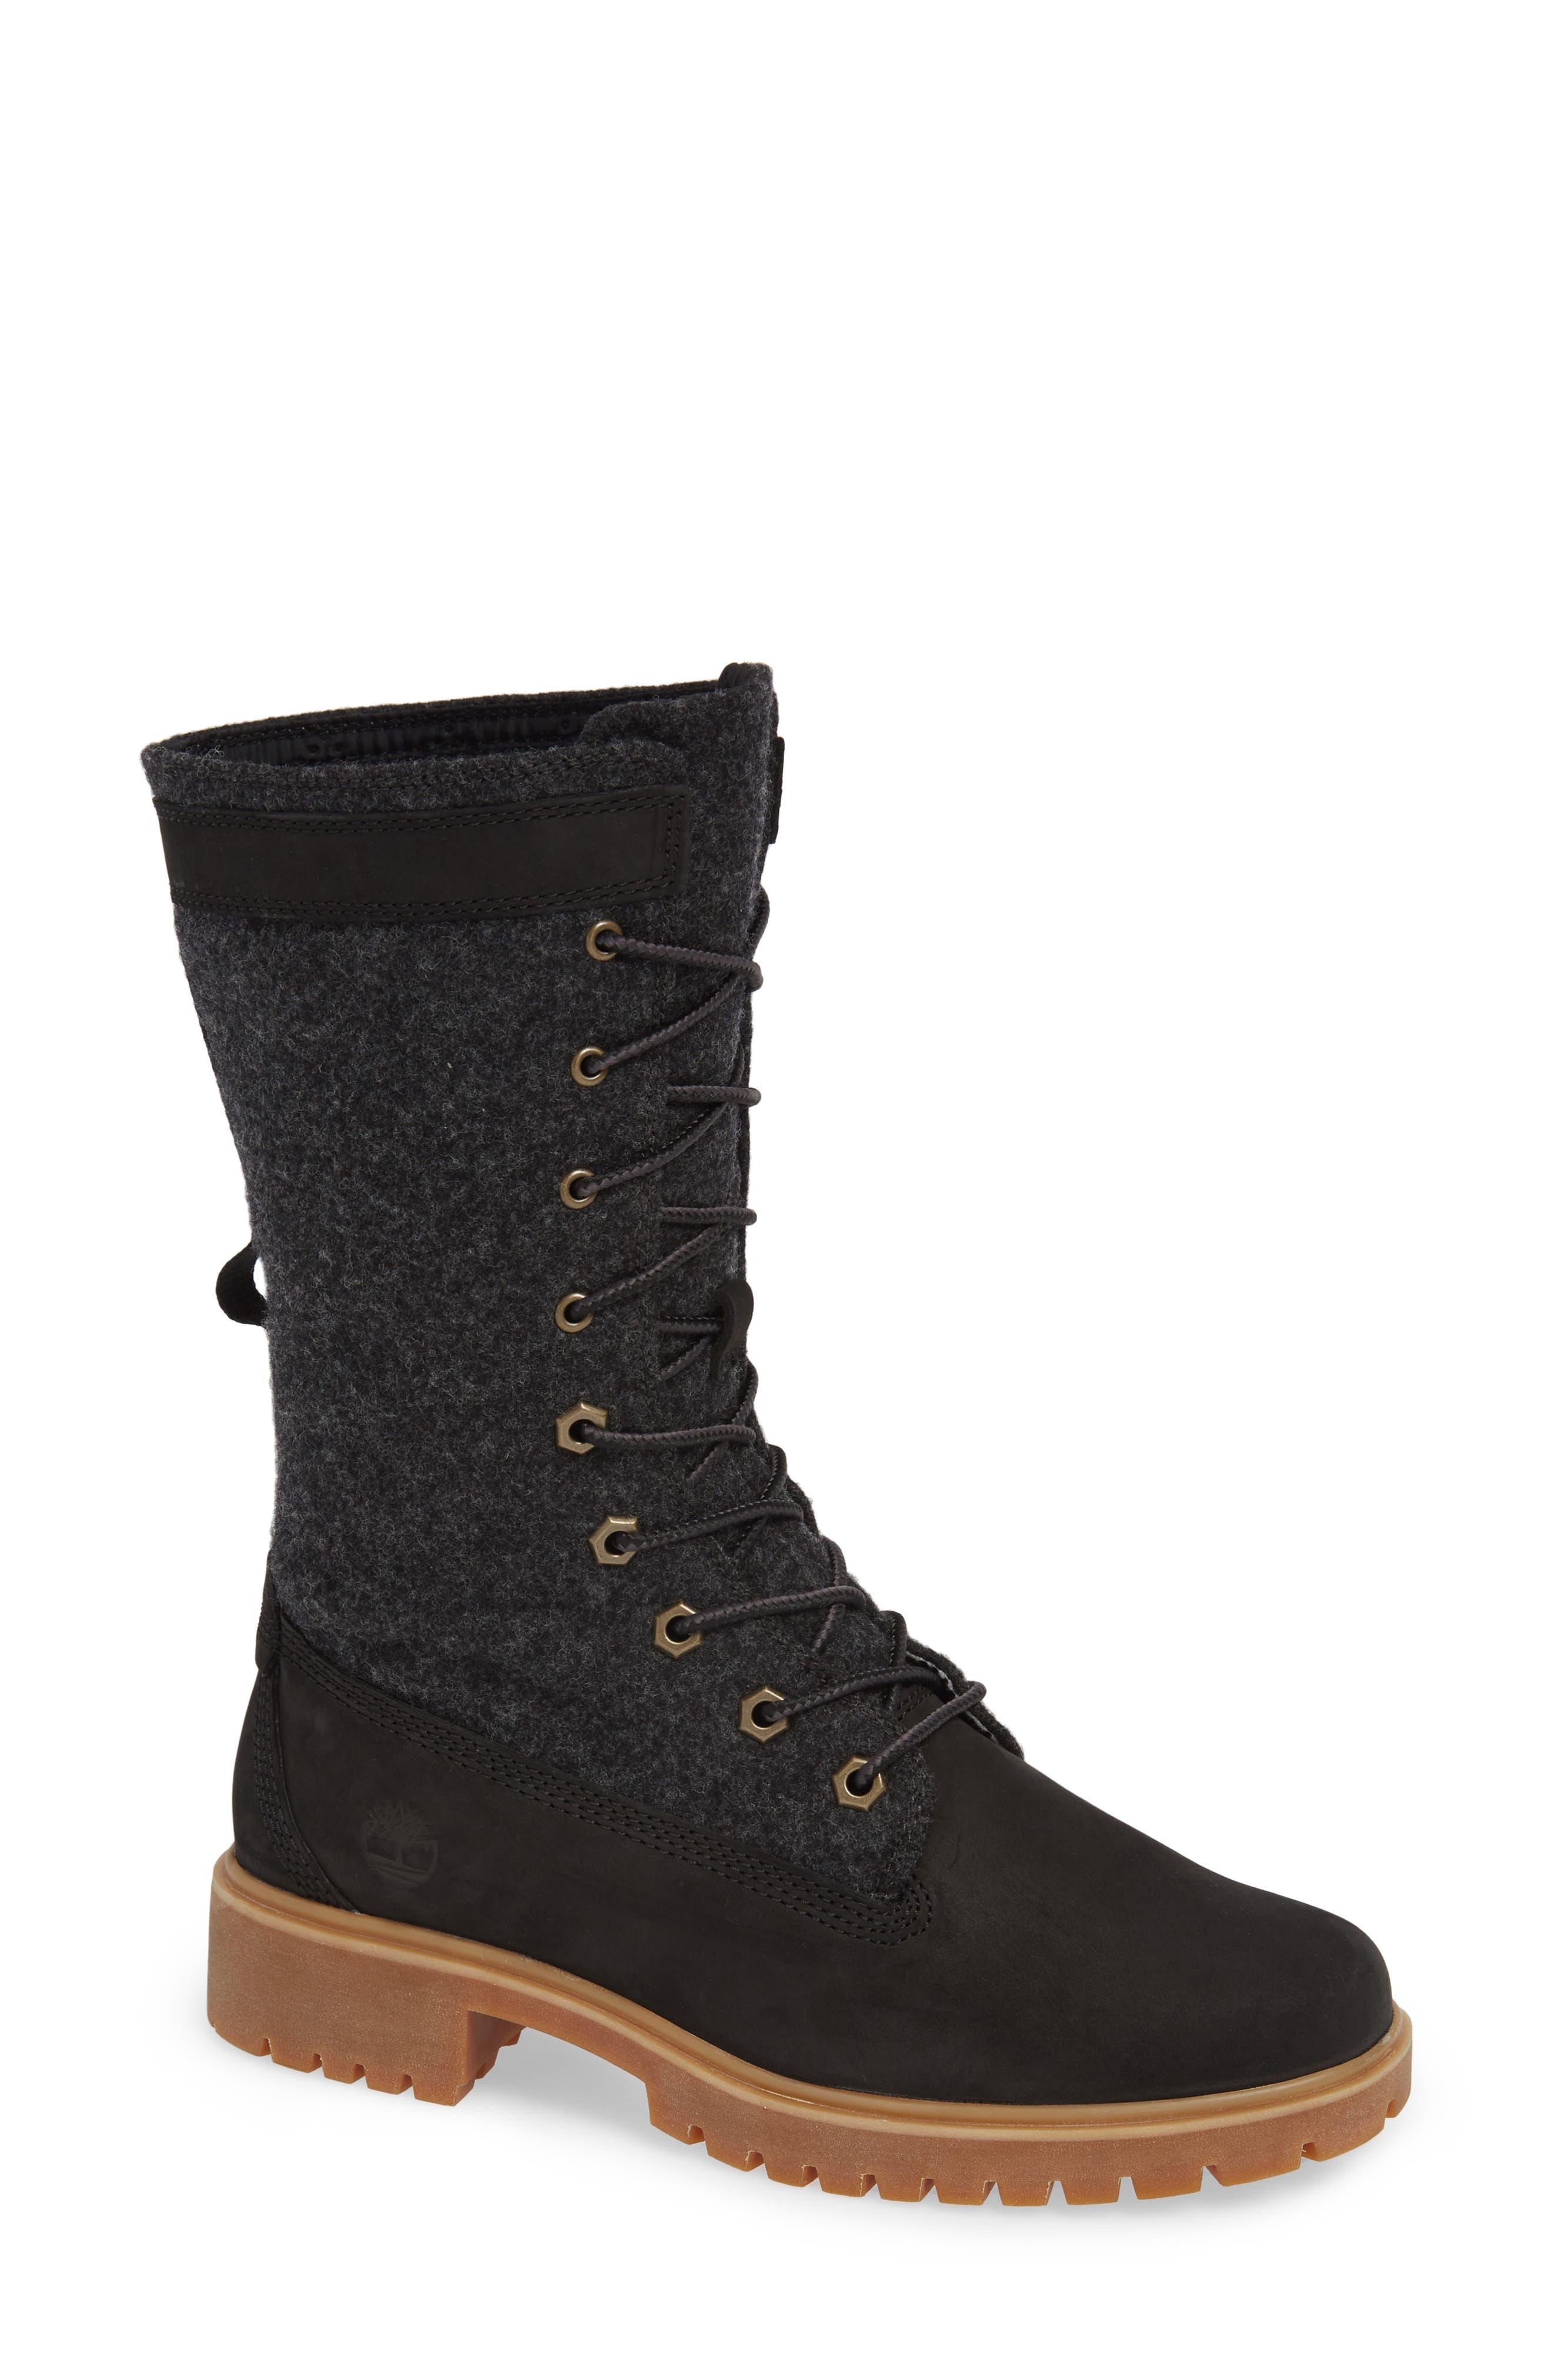 Timberland Jayne Waterproof Gaiter Boot- Grey